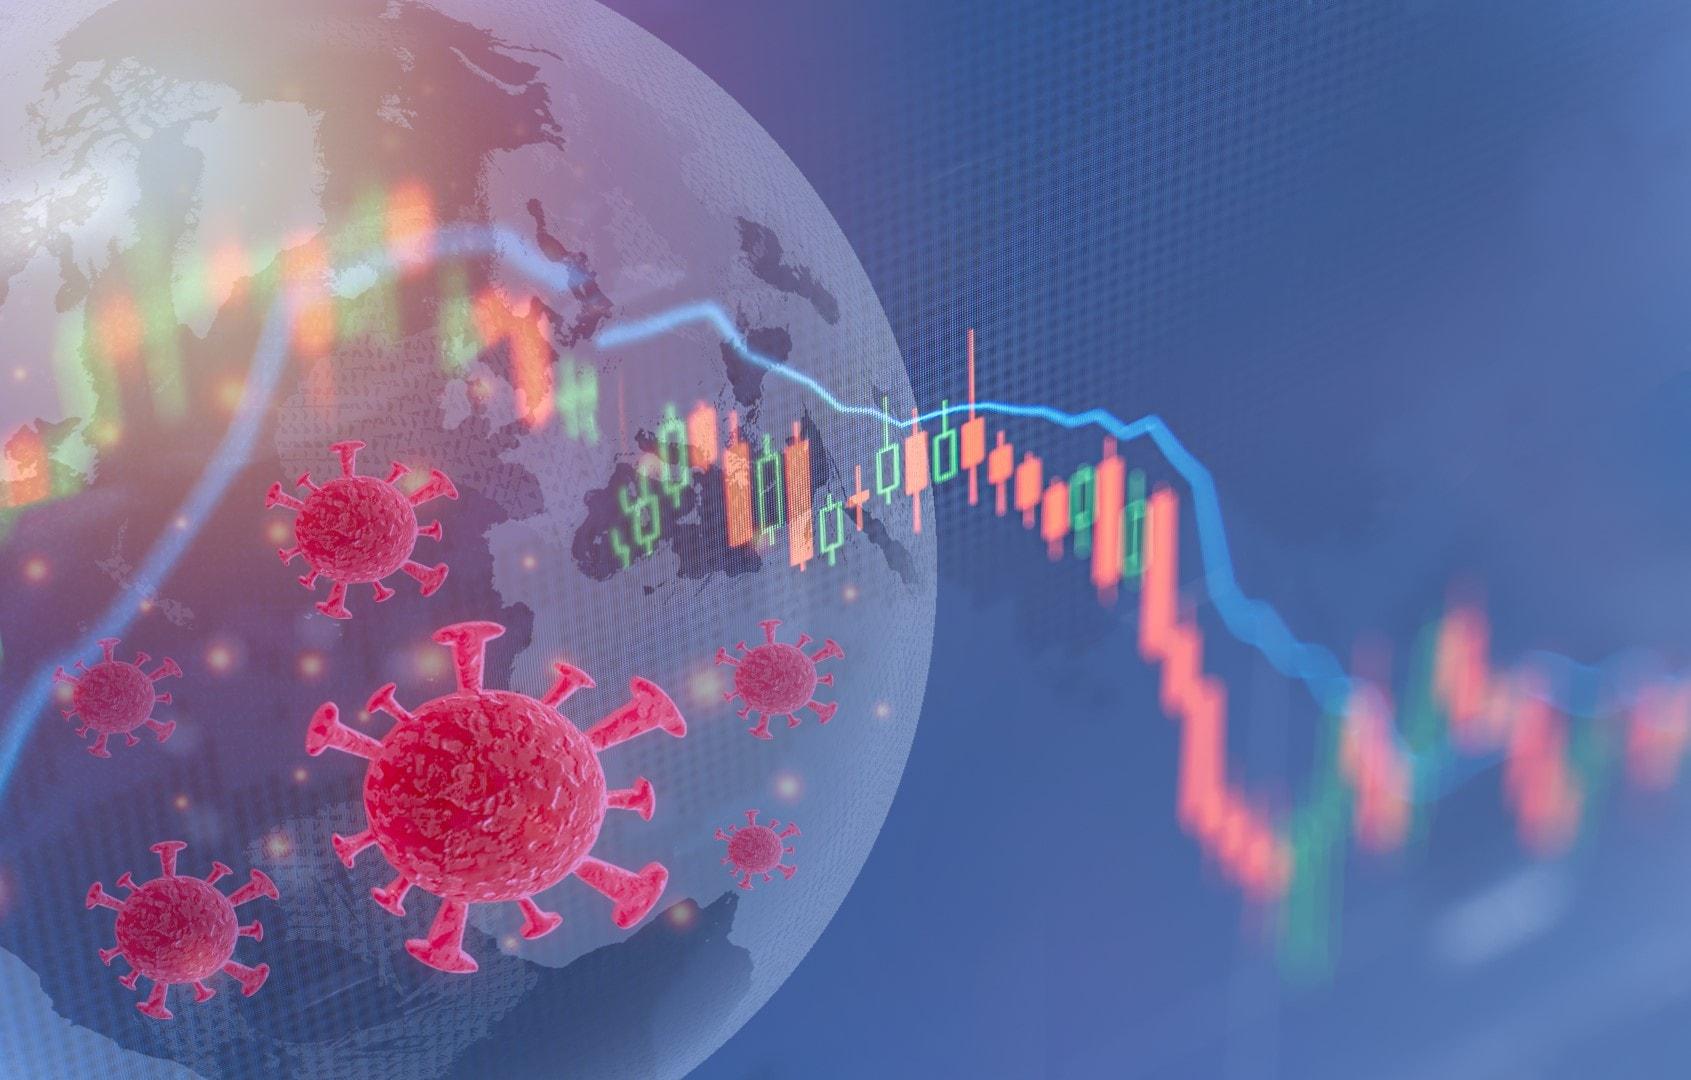 Coronavirus impact global economy stock markets financial crisis concept,The coronavirus or covid-19 sinks the global stock exchanges. Graphs representing the stock market crash caused by Coronavirus